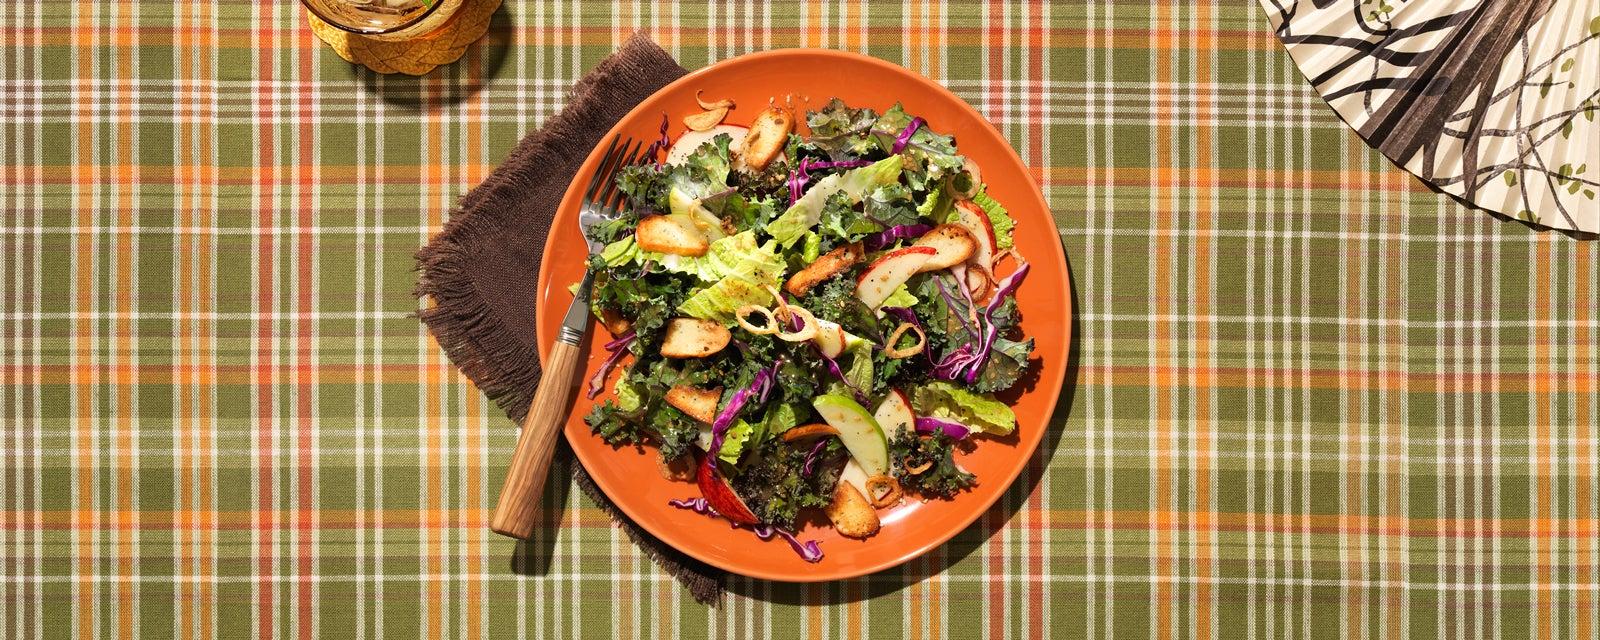 Toasted Sesame Kale & Cabbage Salad